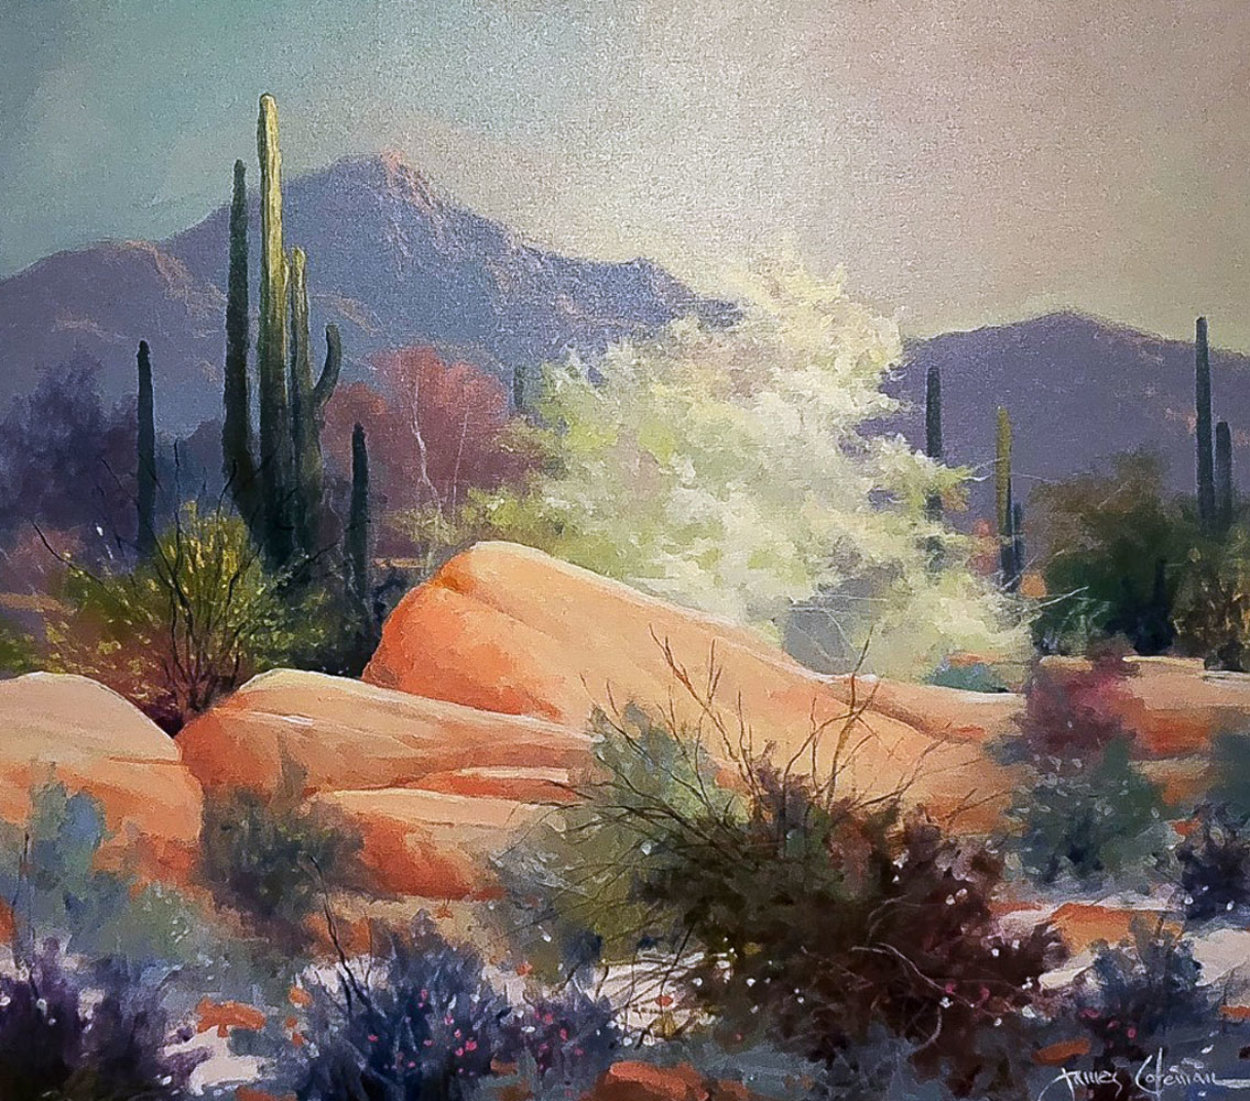 Sonoran Desert 1989 37x43 Super Huge Original Painting by James Coleman